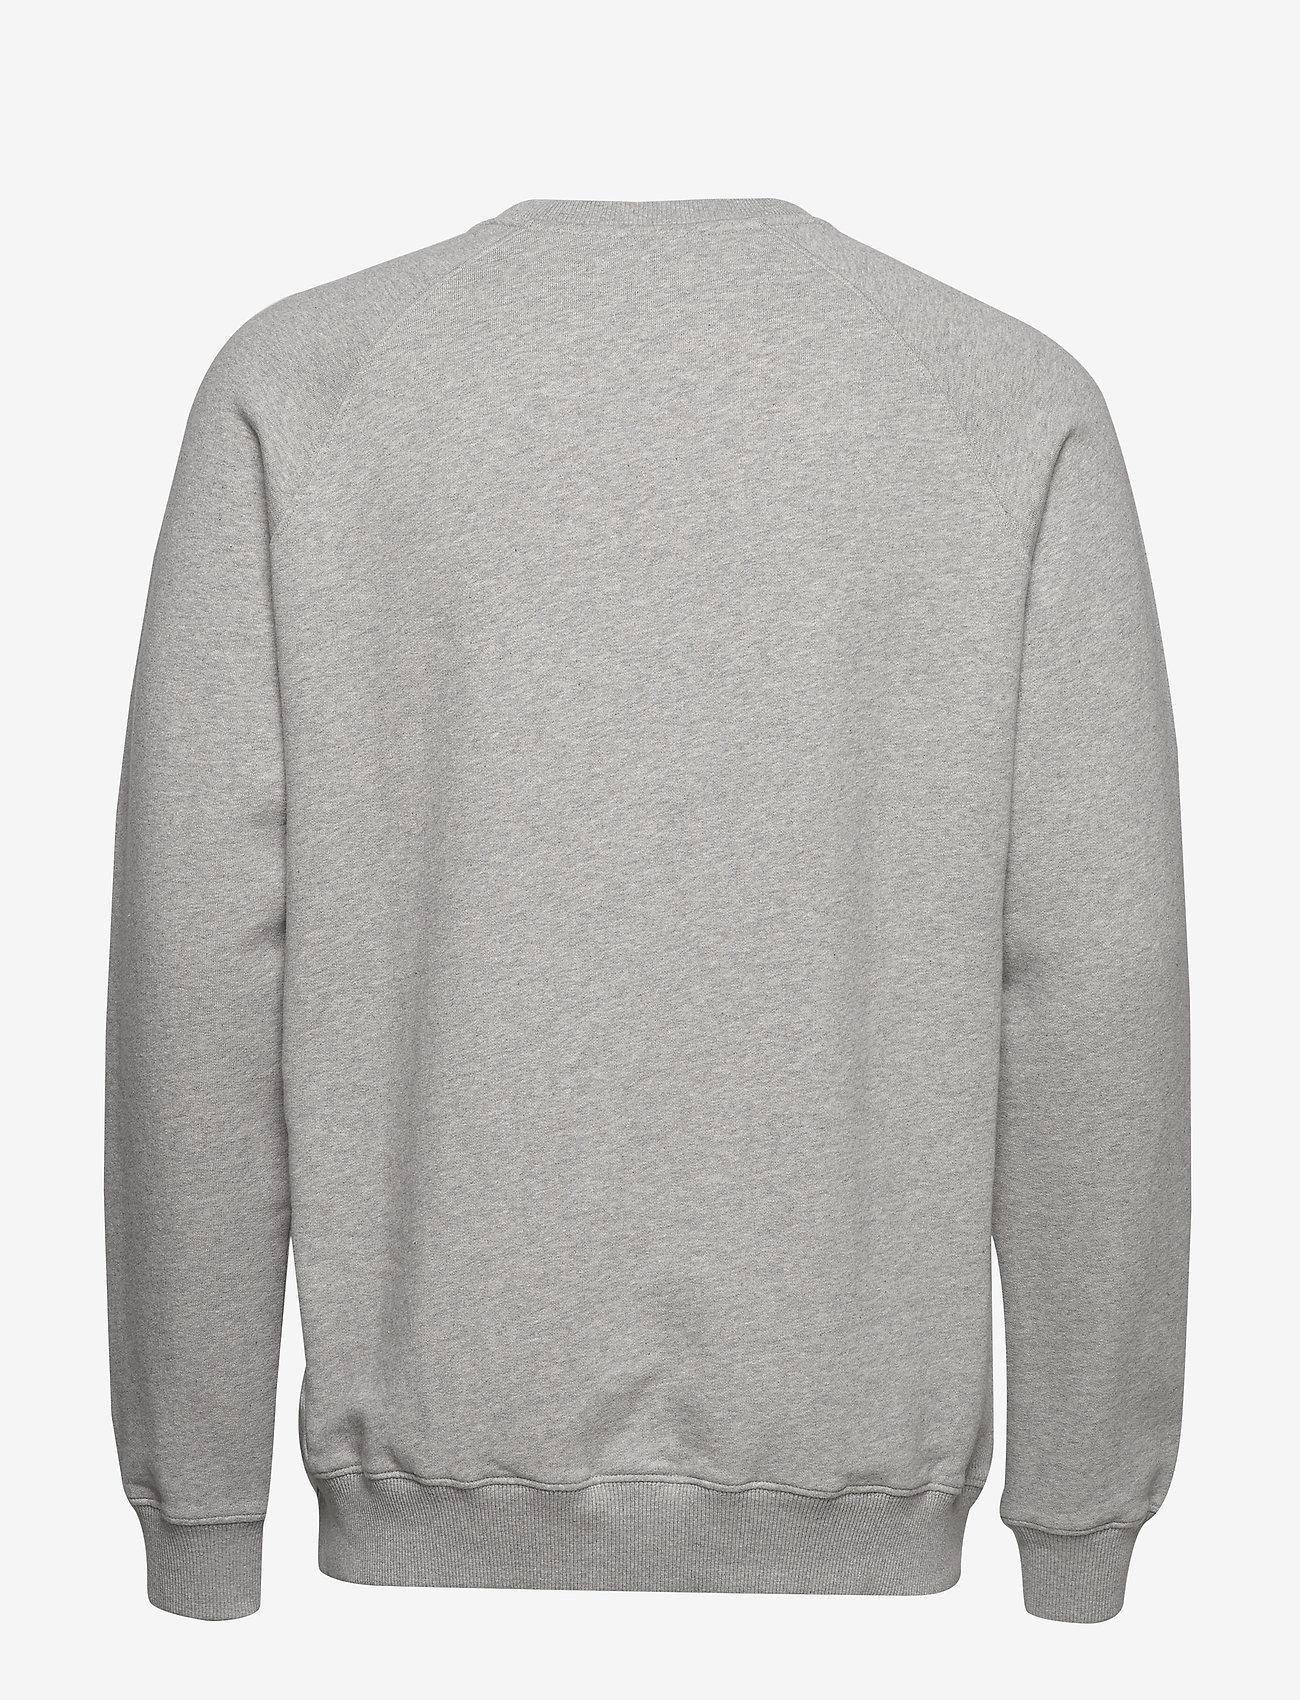 Forét - OX SWEATSHIRT - basic-sweatshirts - light grey melange - 1